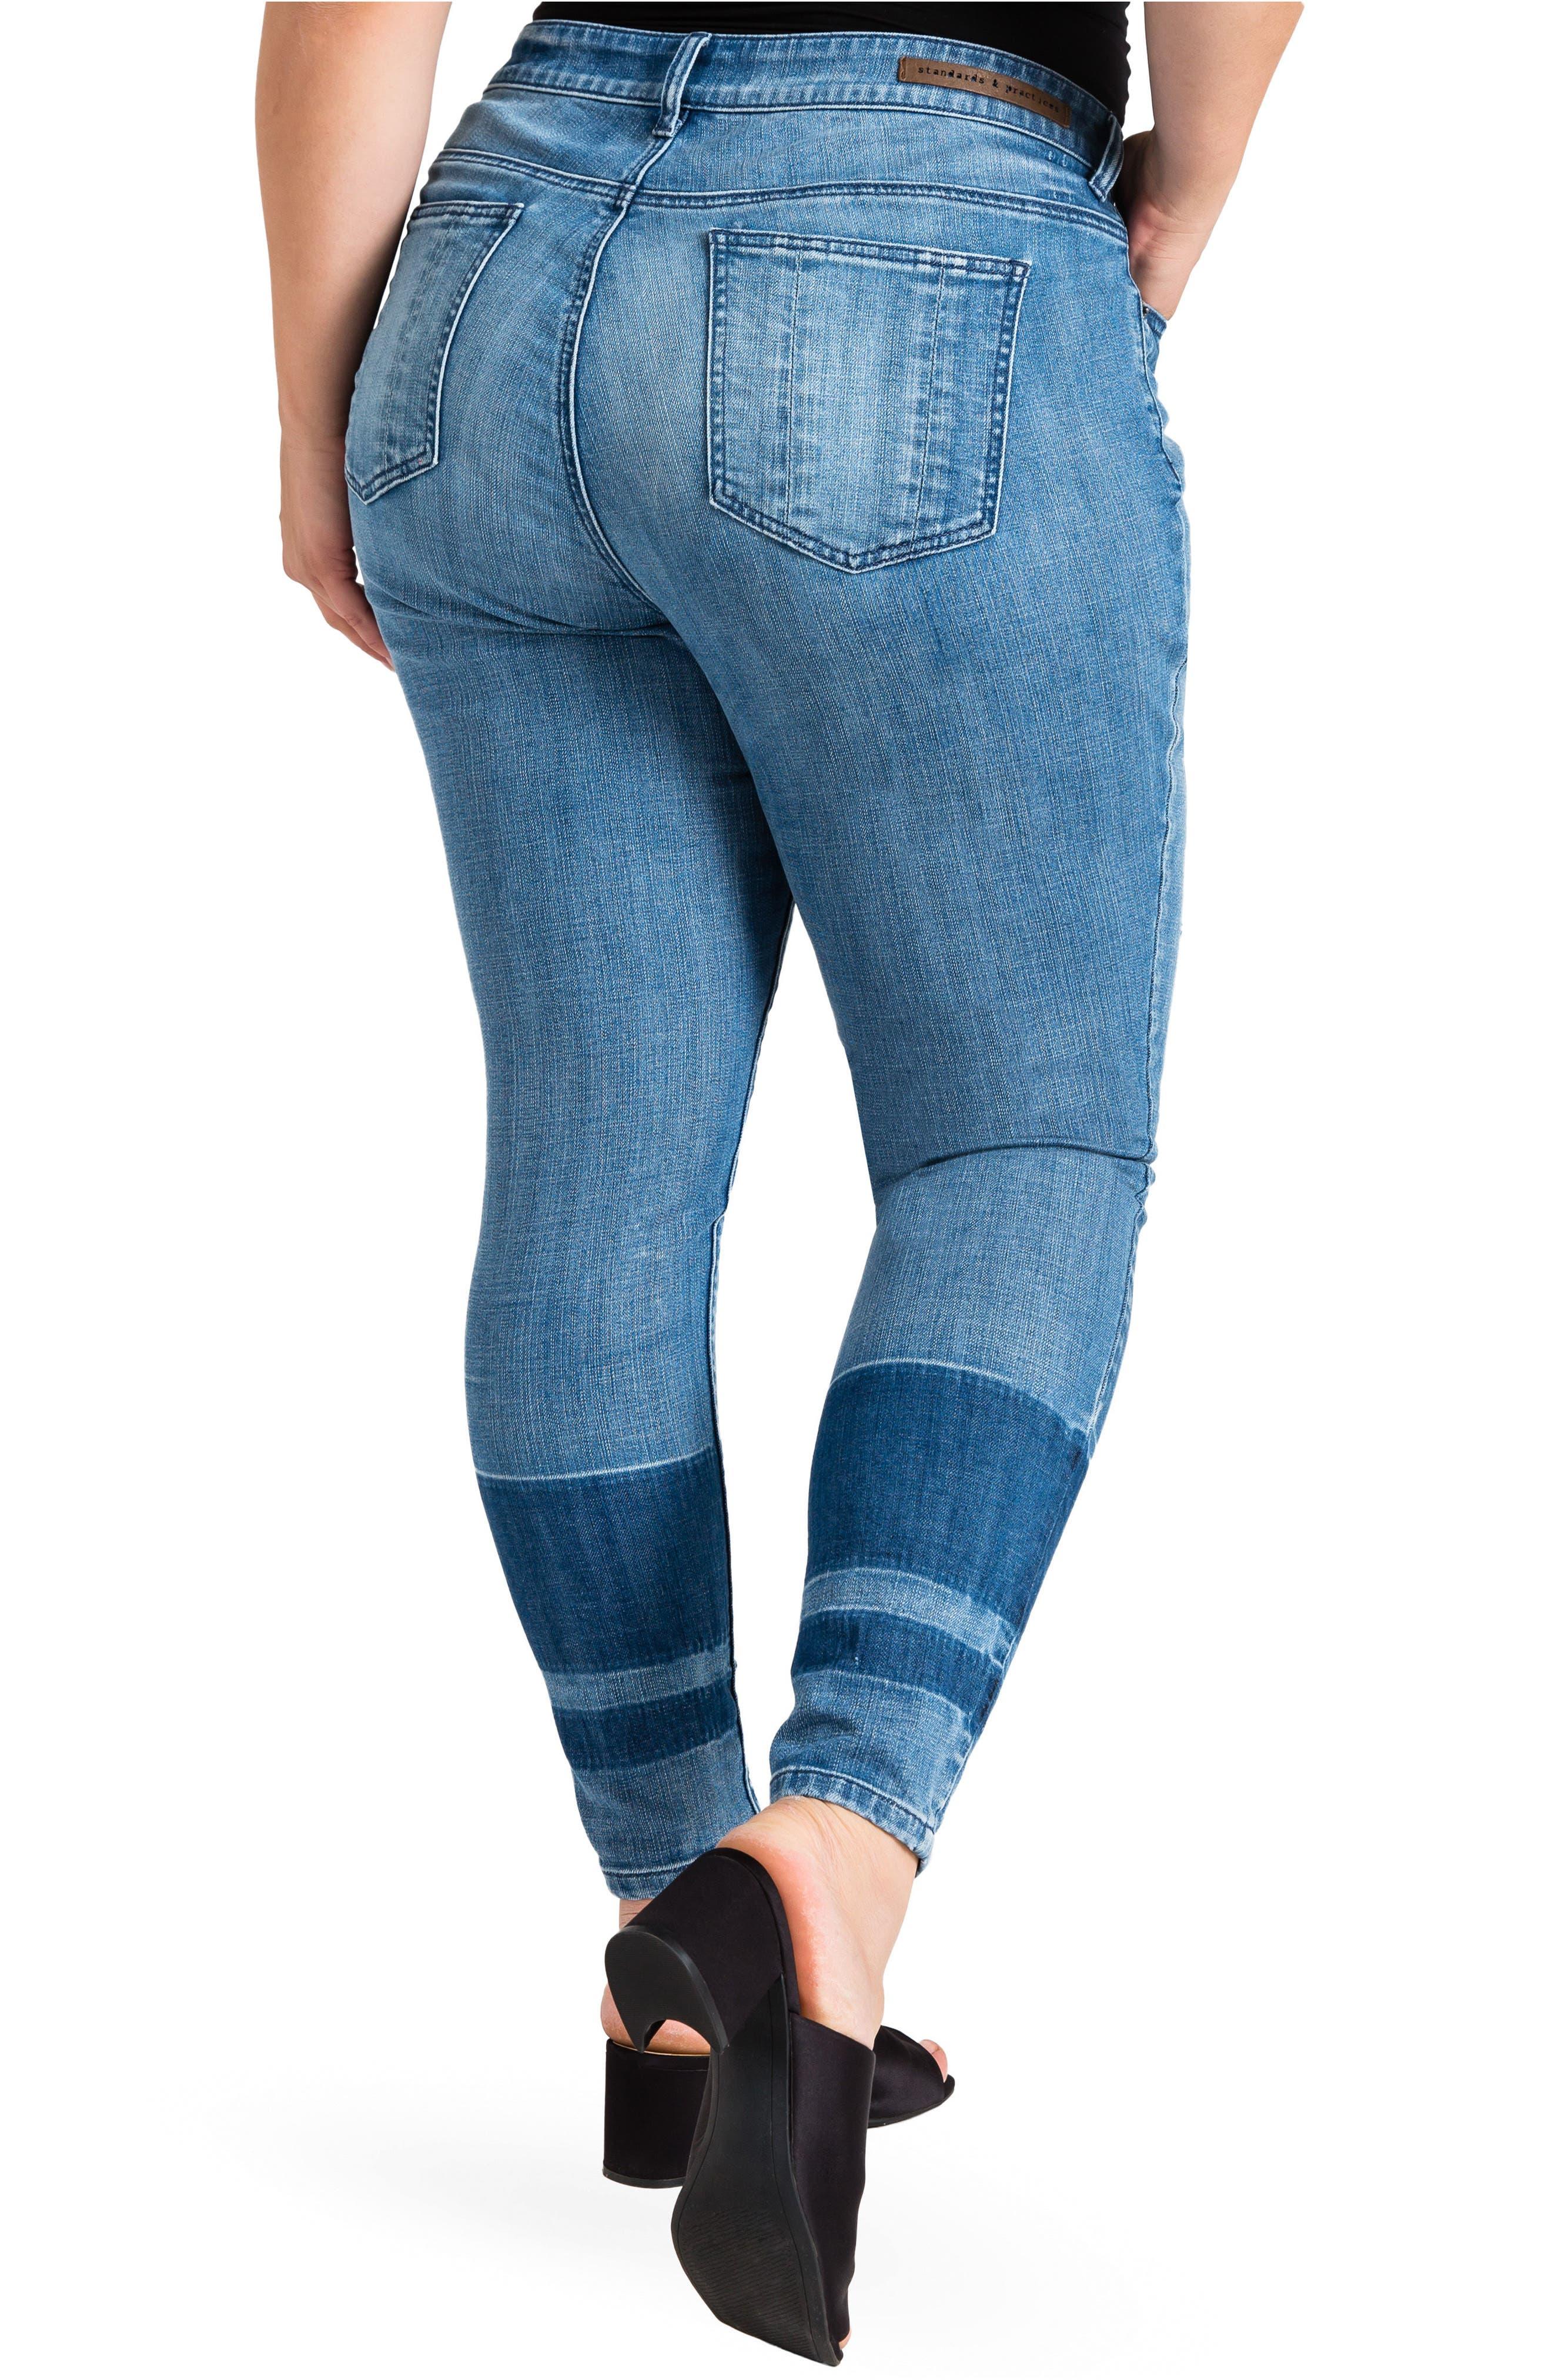 Virginia Ankle Skinny Jeans,                             Alternate thumbnail 2, color,                             MEDIUM BLUE